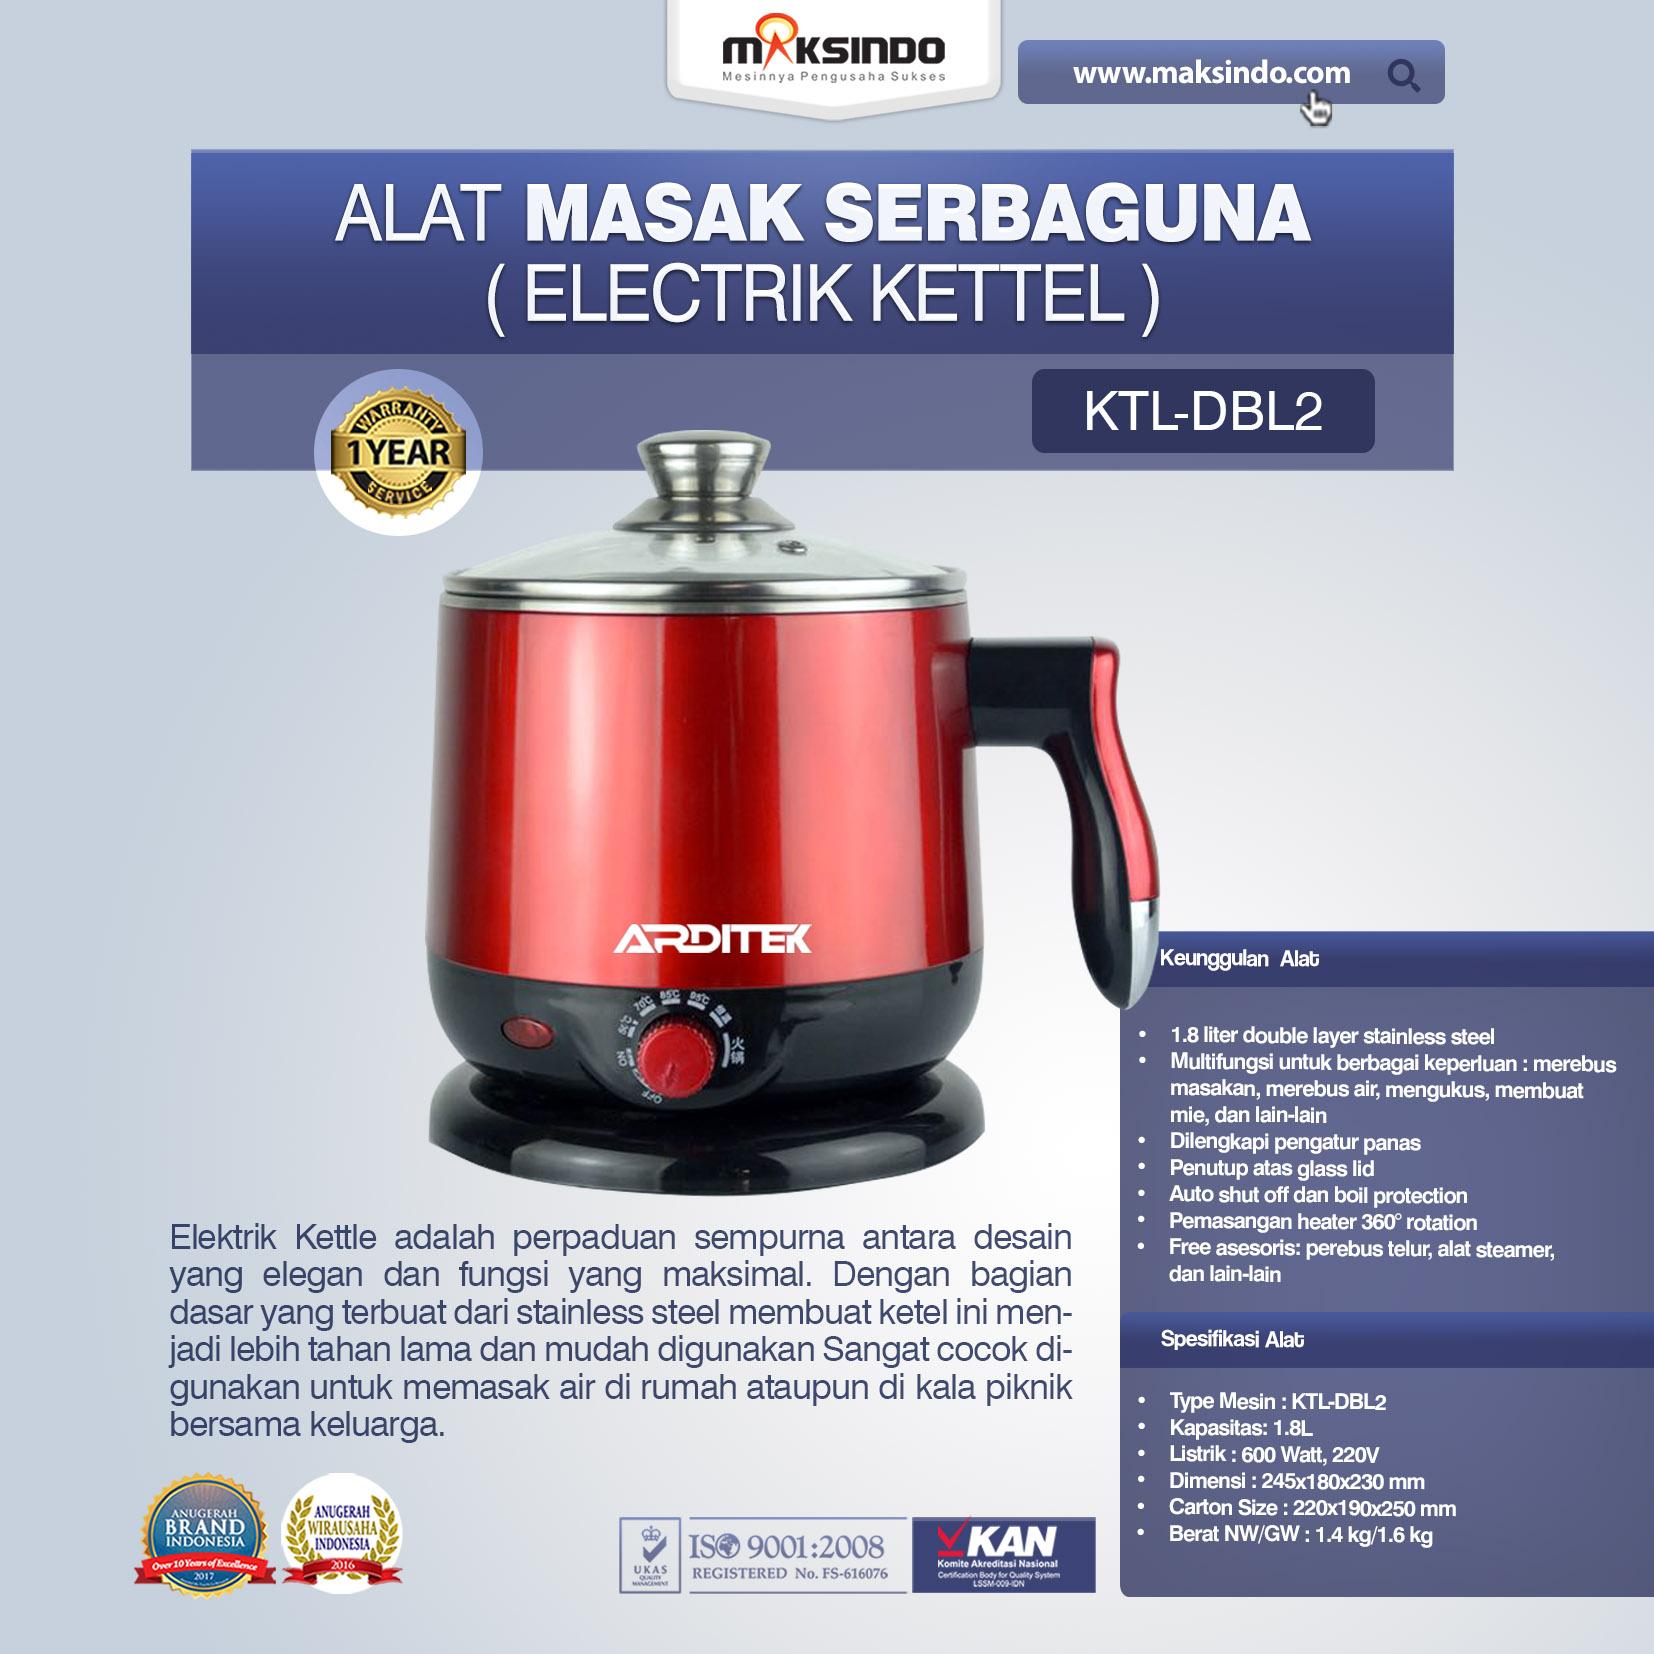 Jual Alat Masak Serbaguna (Electrik Kettel) di Palembang